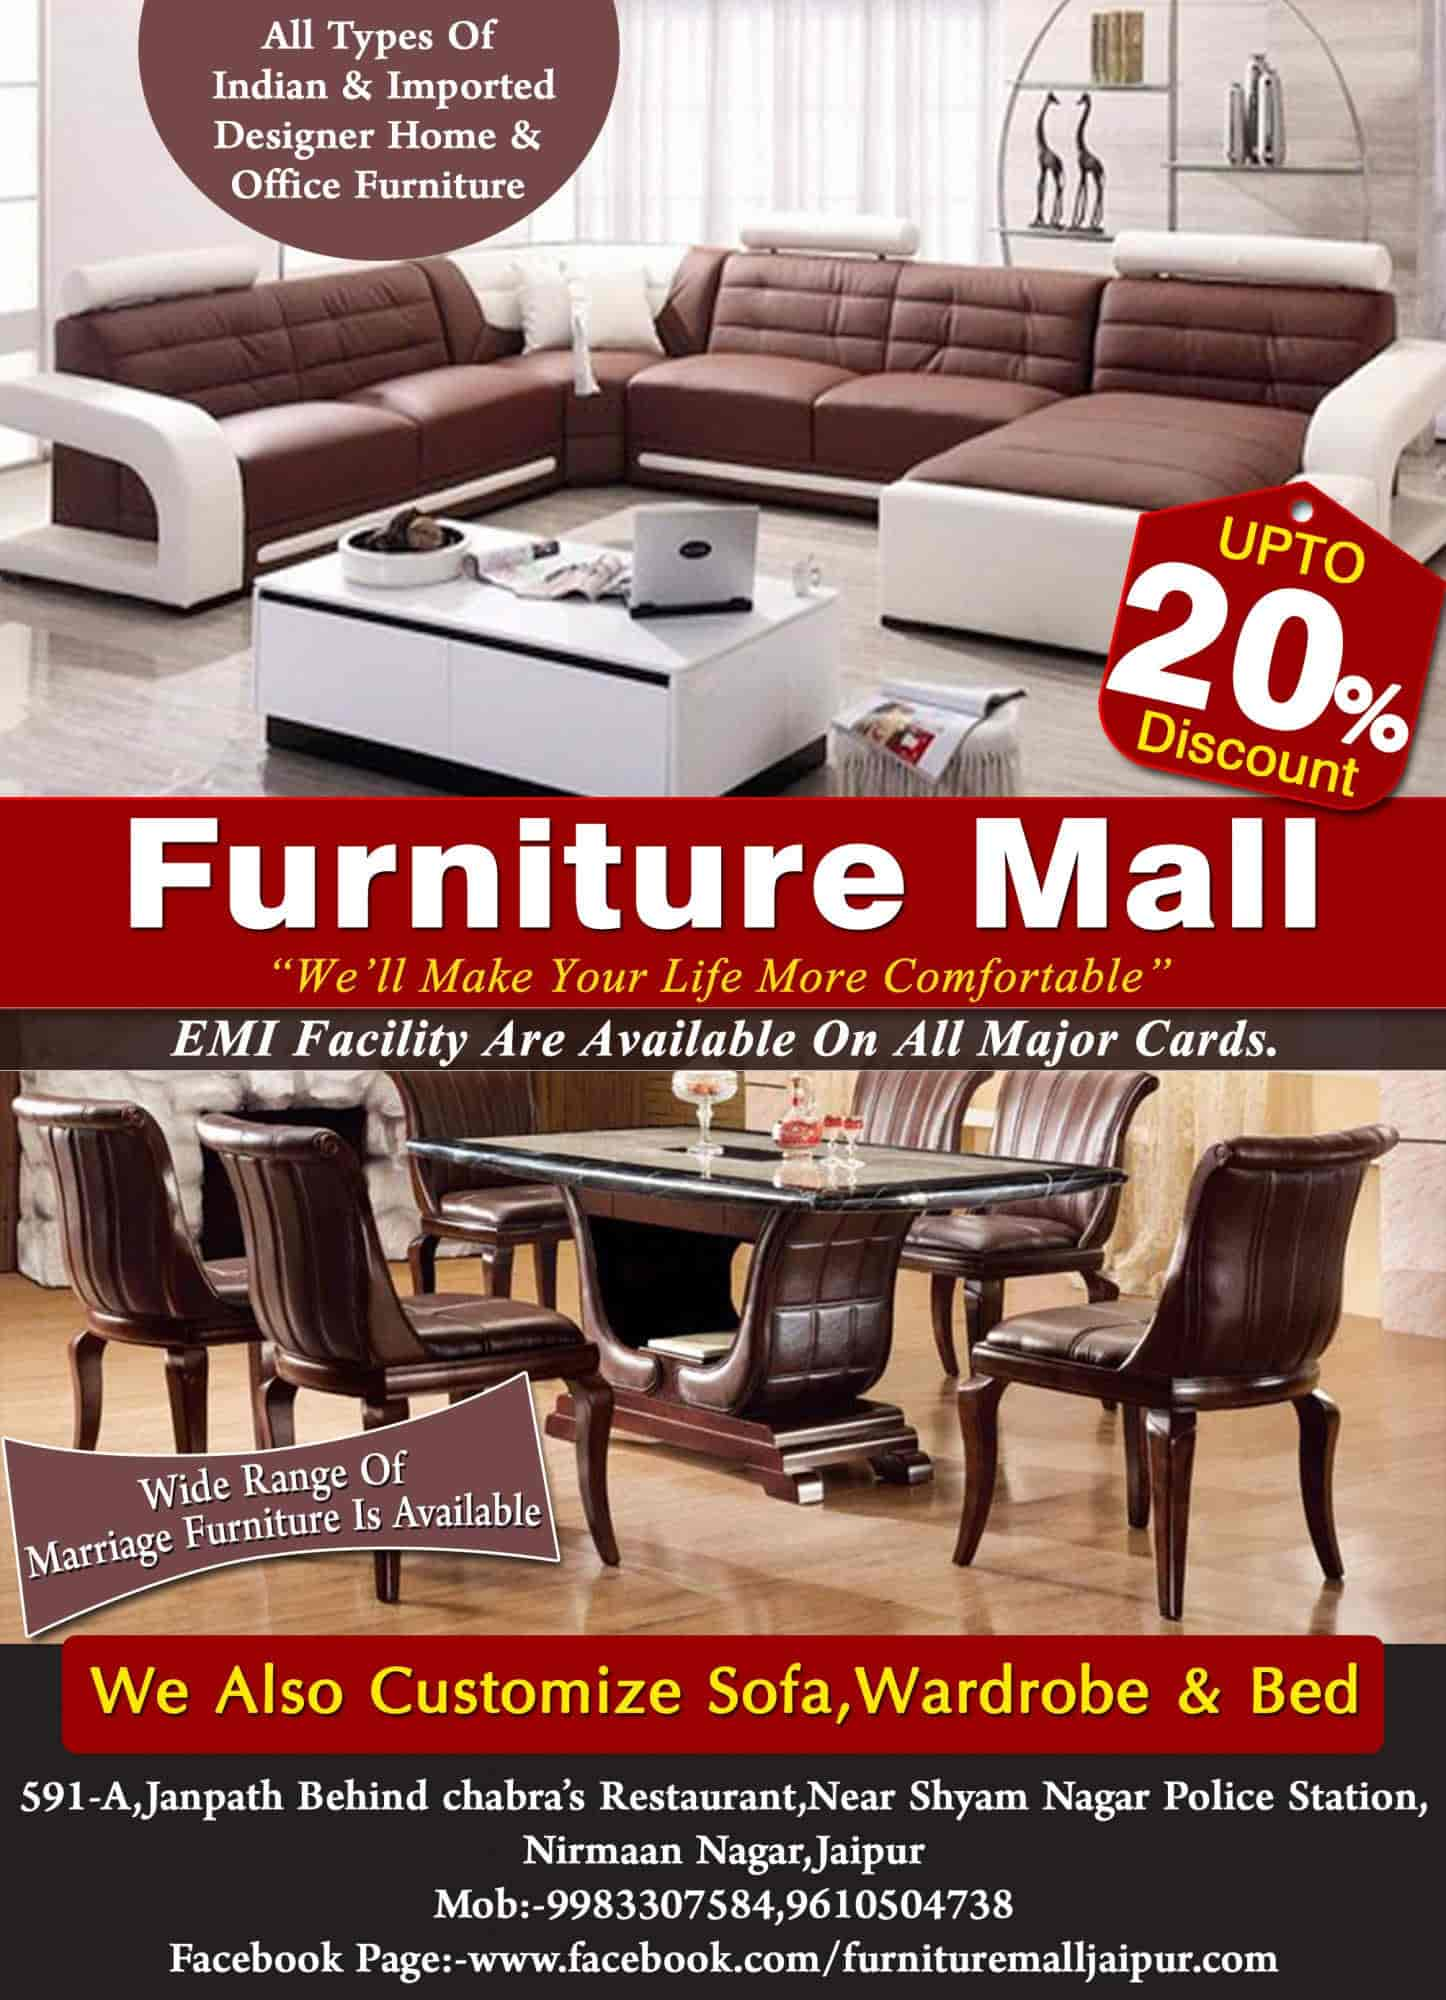 Furniture Mall Nirman Nagar Furniture Dealers in Jaipur Justdial